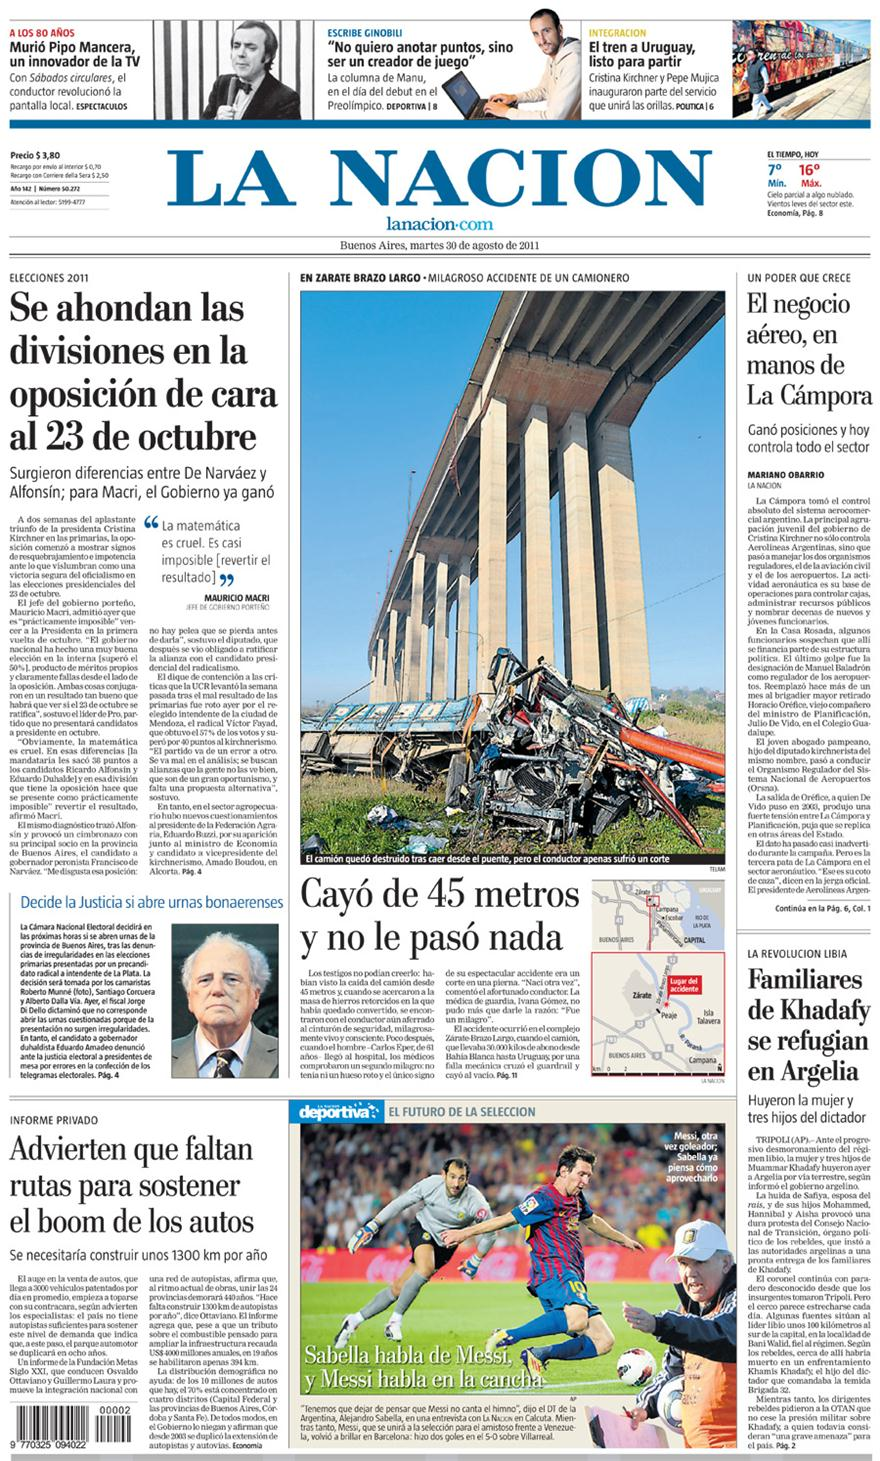 Tapa diarios la nacion clarin 30 08 11 report show for Diarios del espectaculo